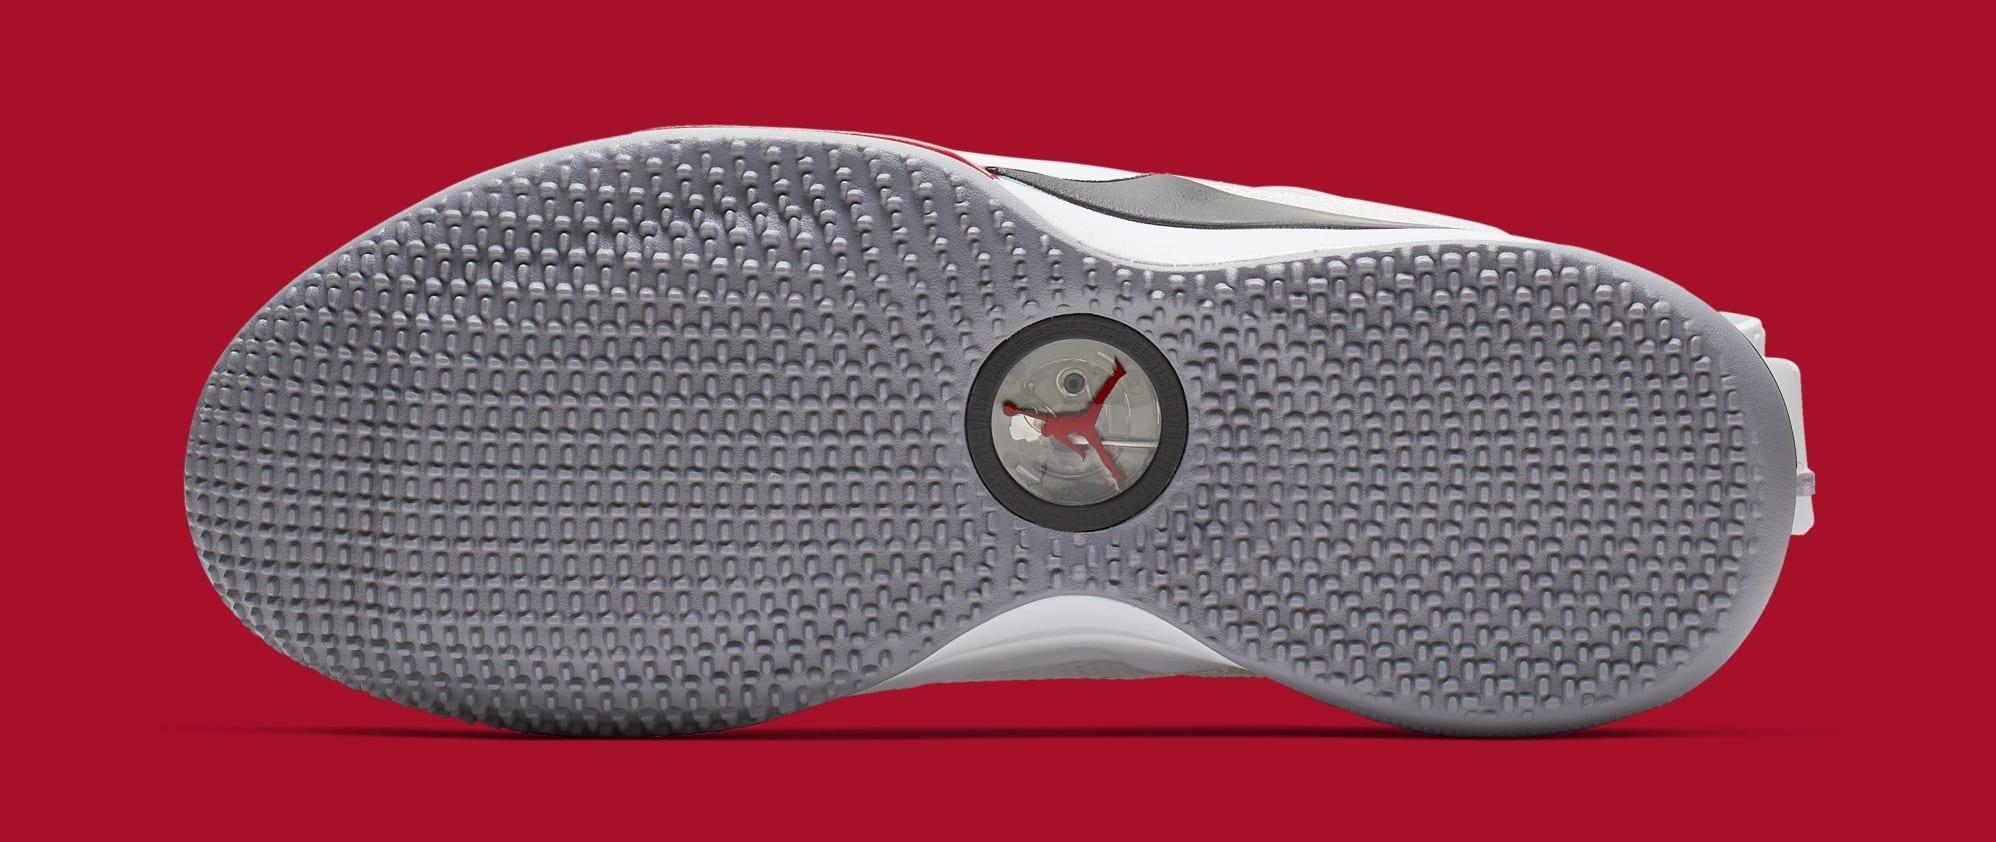 new products 88962 13557 Image via Nike Air Jordan 33 Low SE CD9560-106 (Bottom)